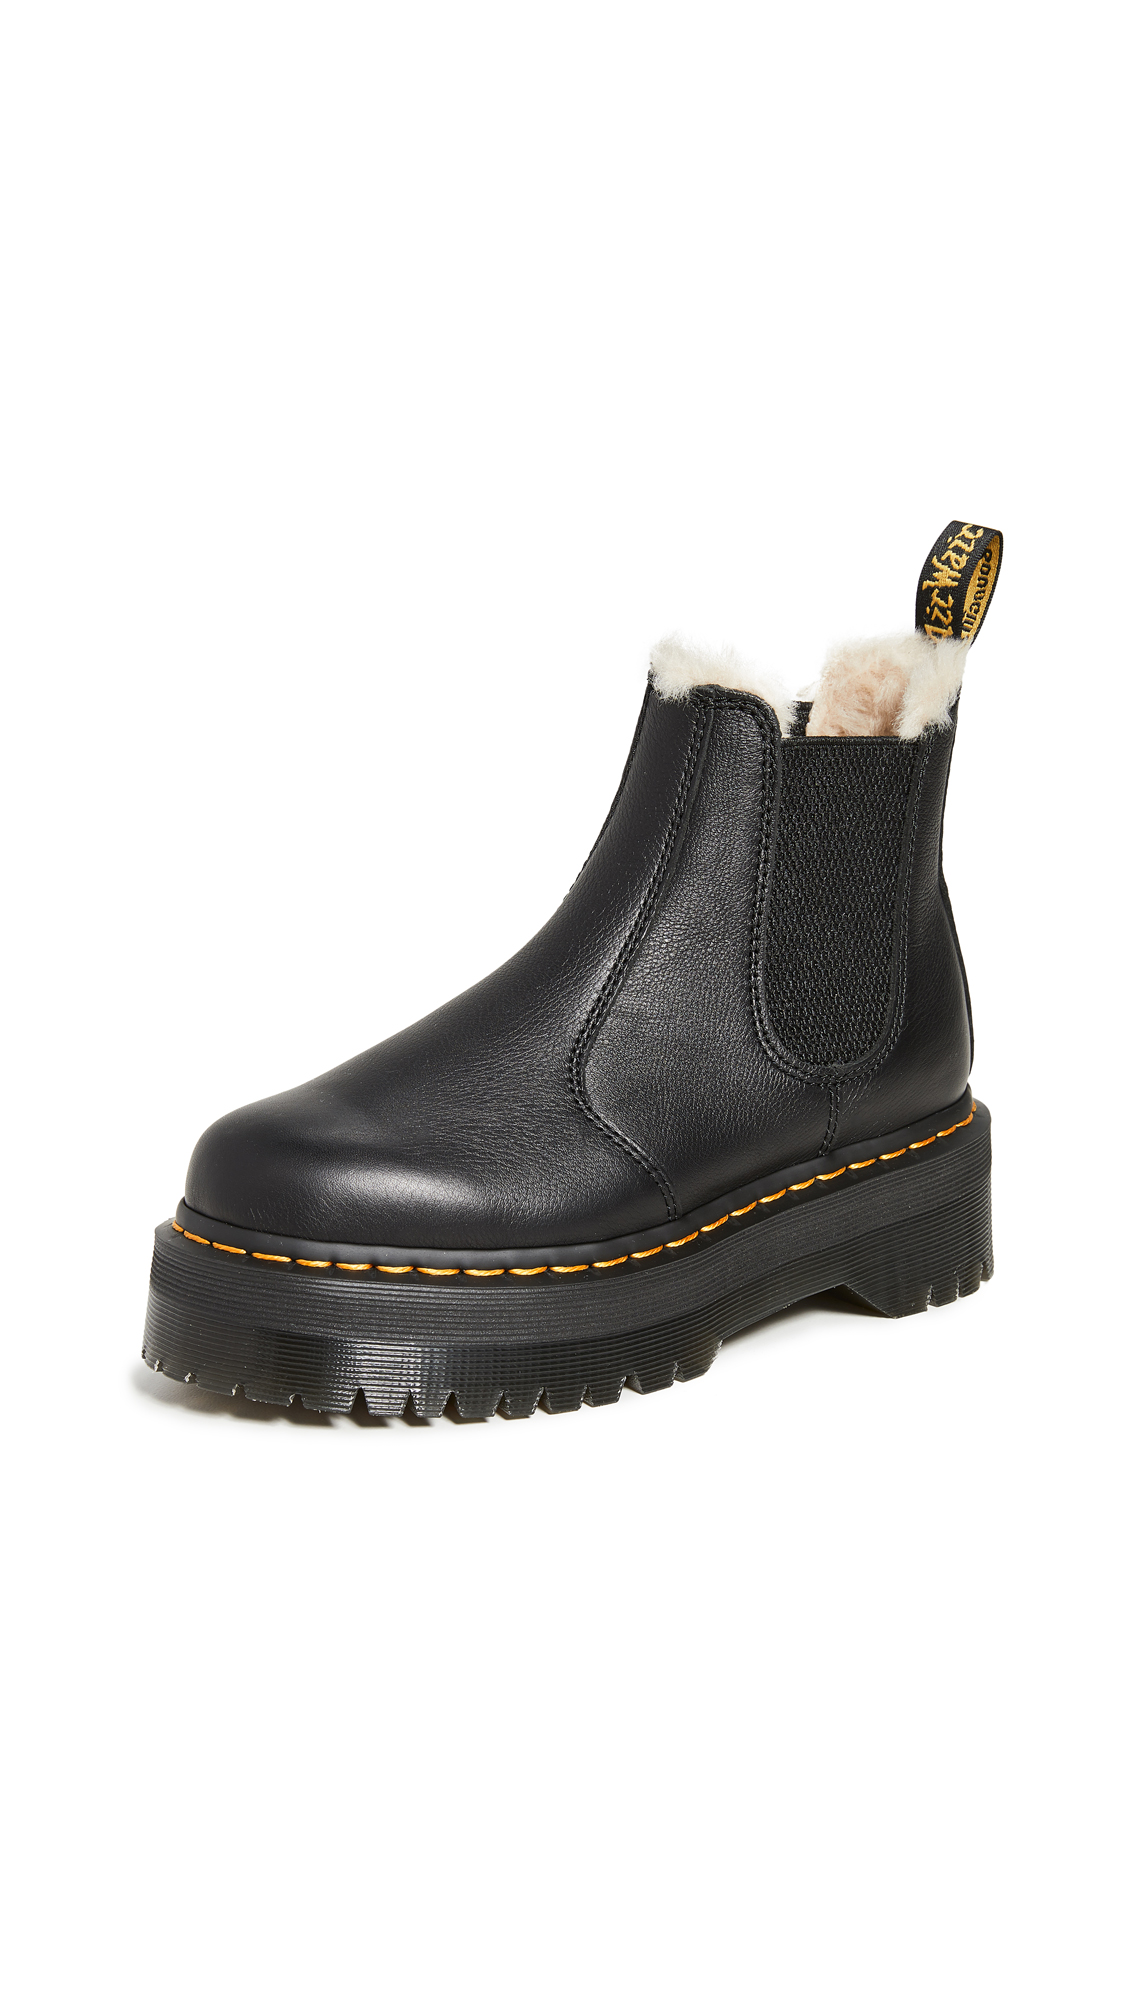 Buy Dr. Martens 2976 Quad FL Boots online, shop Dr. Martens